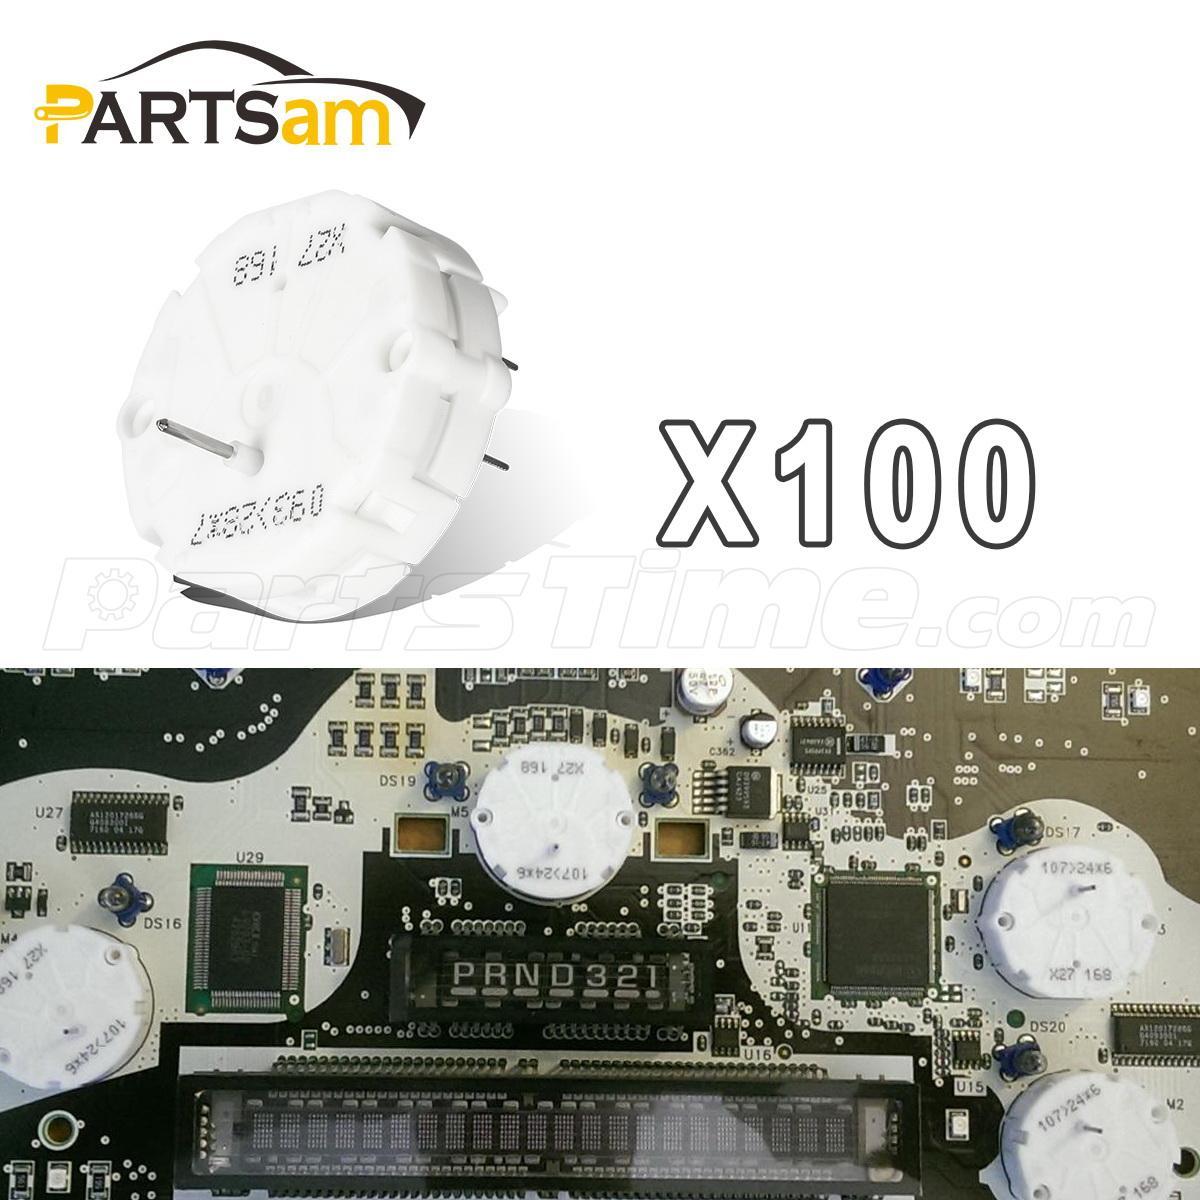 100x x27 168 stepper motors speedometer instrument cluster for 2004 silverado stepper motor